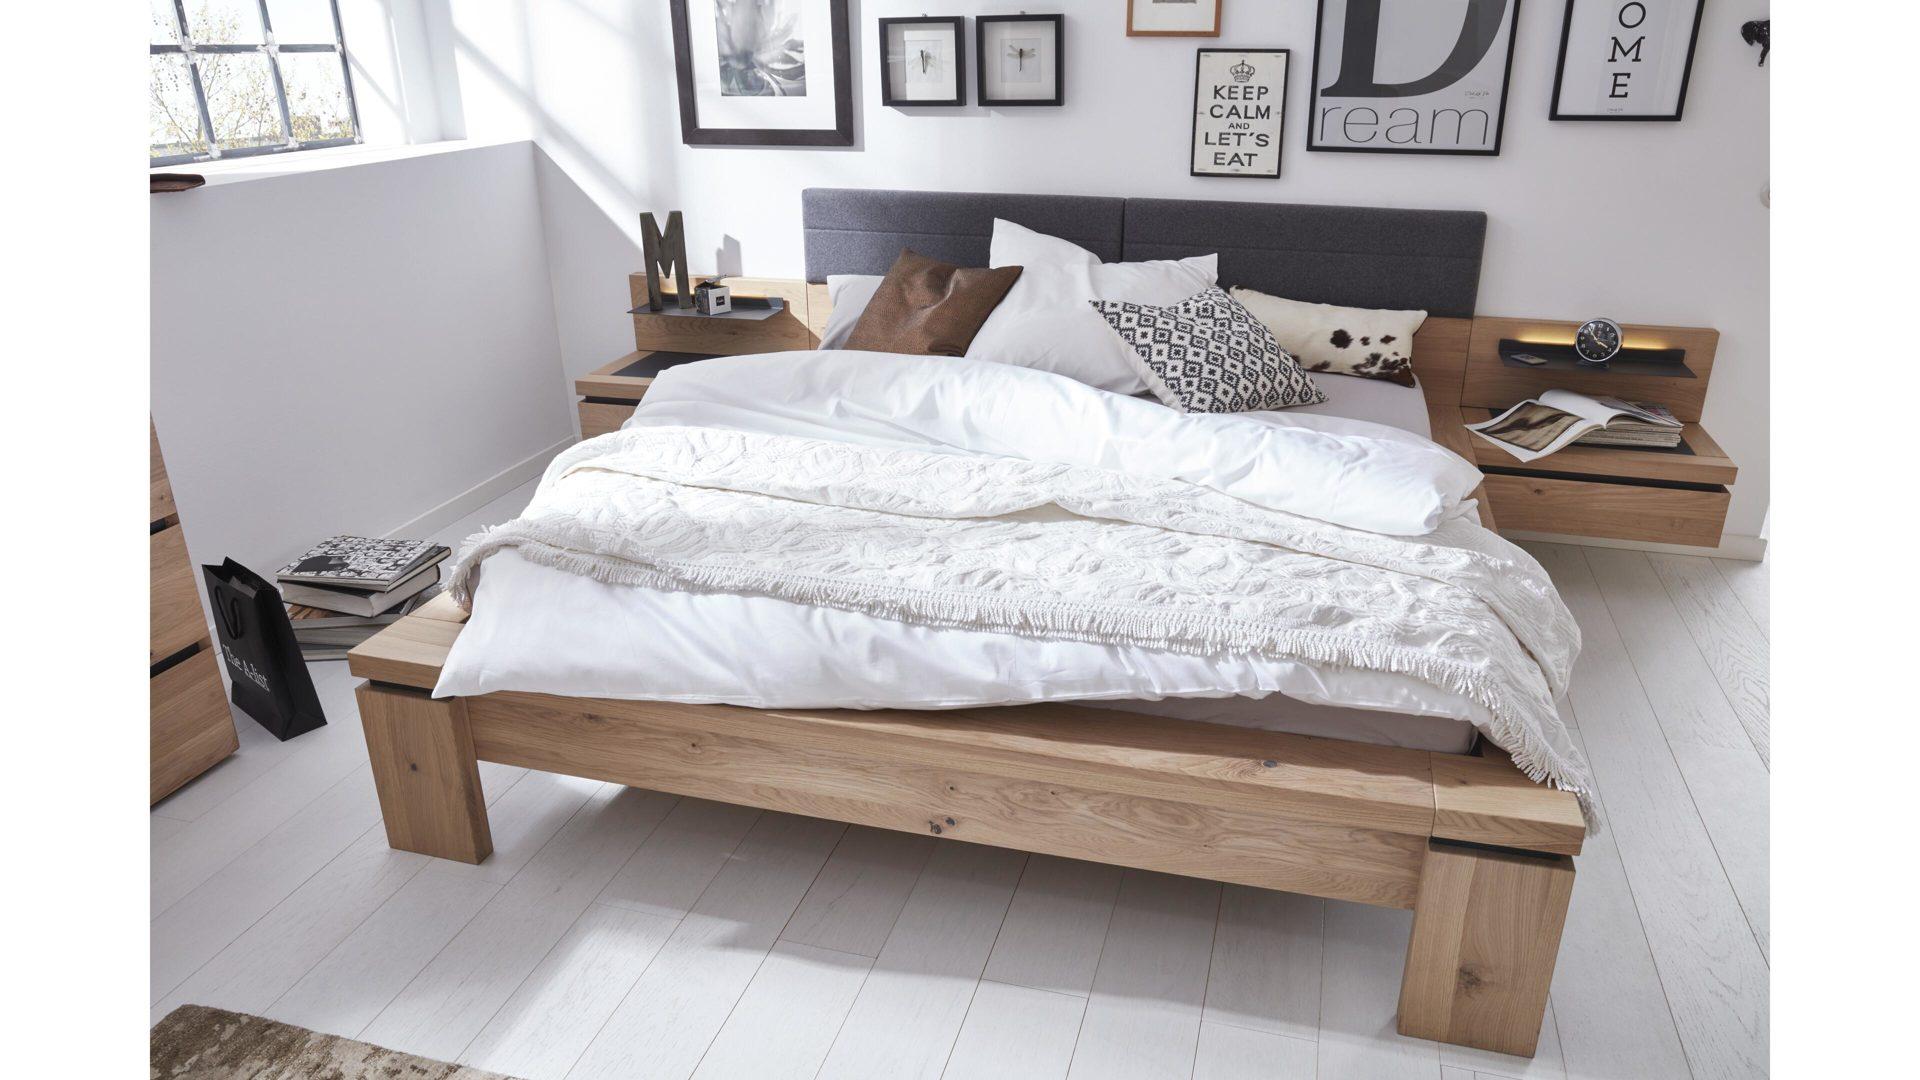 Möbel Boer Coesfeld, Räume, Schlafzimmer, Betten, Boxspringbett ...